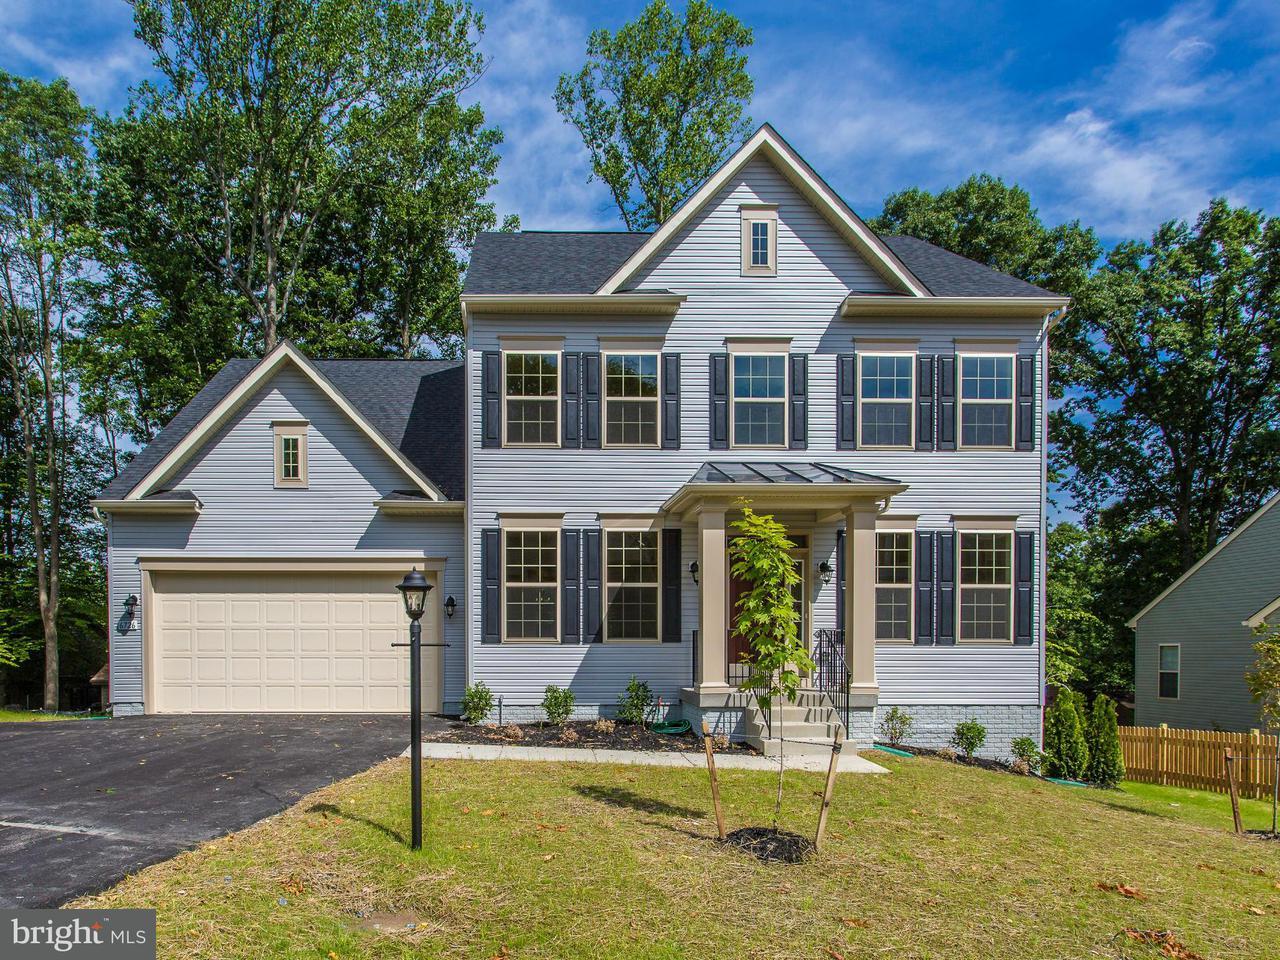 Casa Unifamiliar por un Venta en 390 CANTOR Court 390 CANTOR Court New Market, Maryland 21774 Estados Unidos